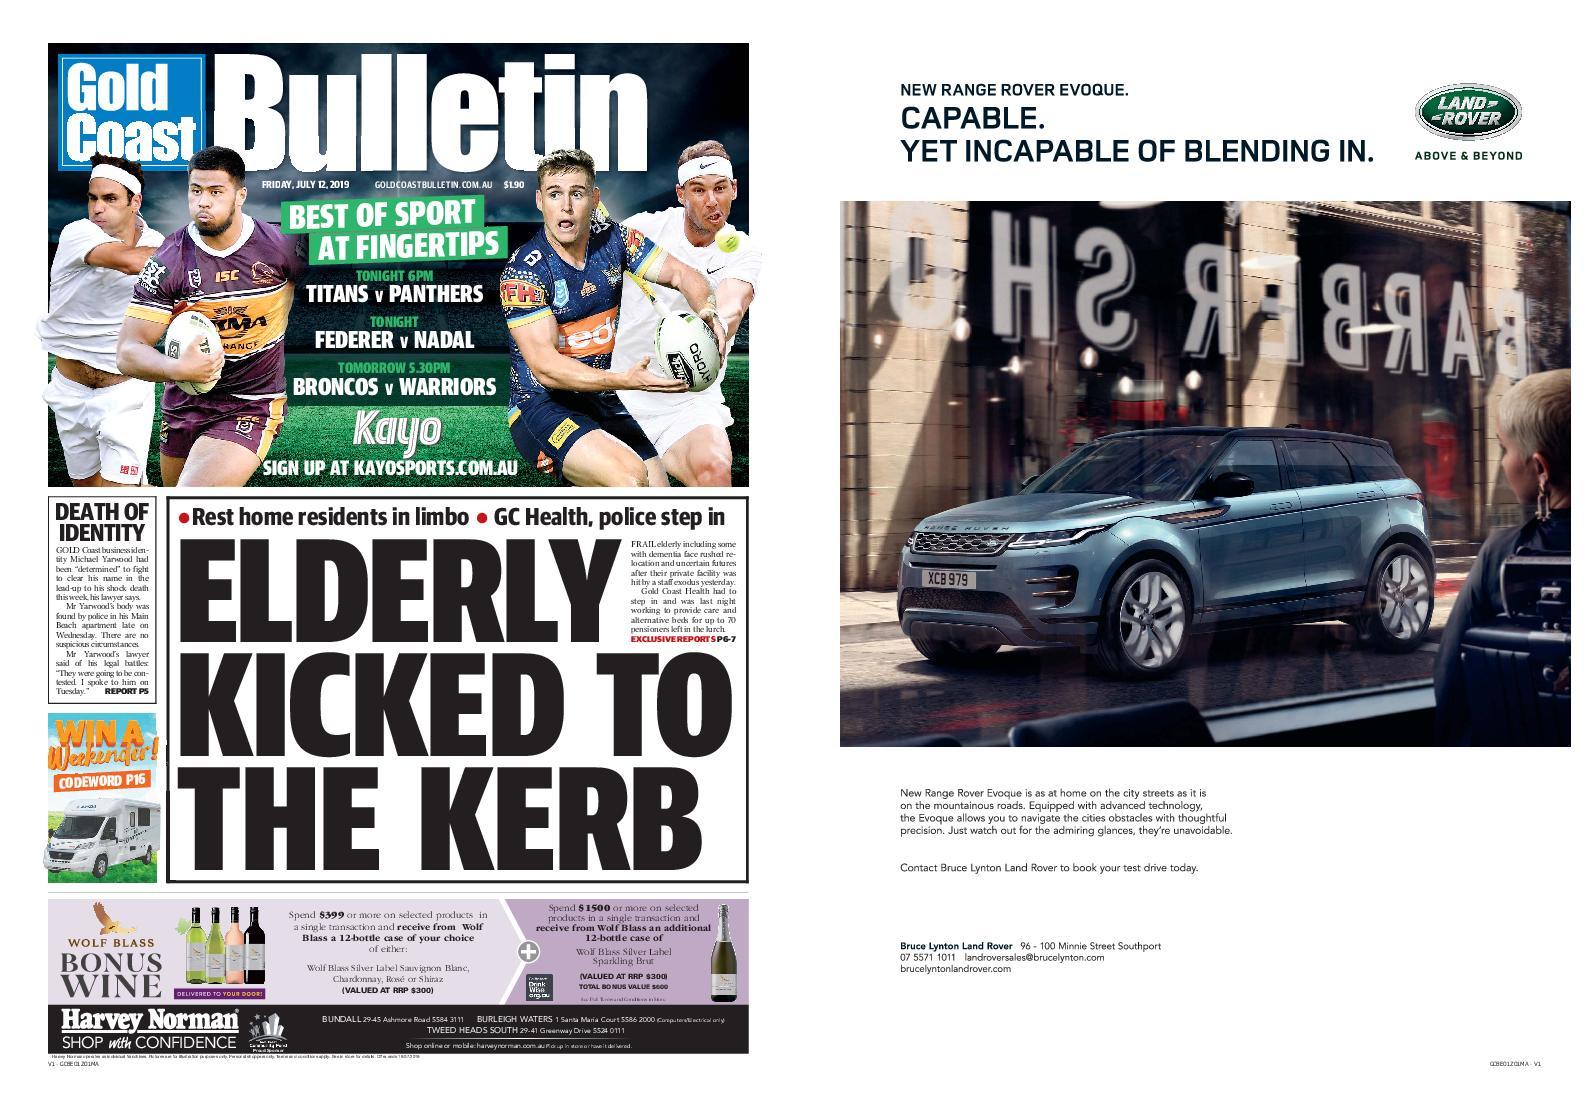 The Gold Coast Bulletin – July 12, 2019